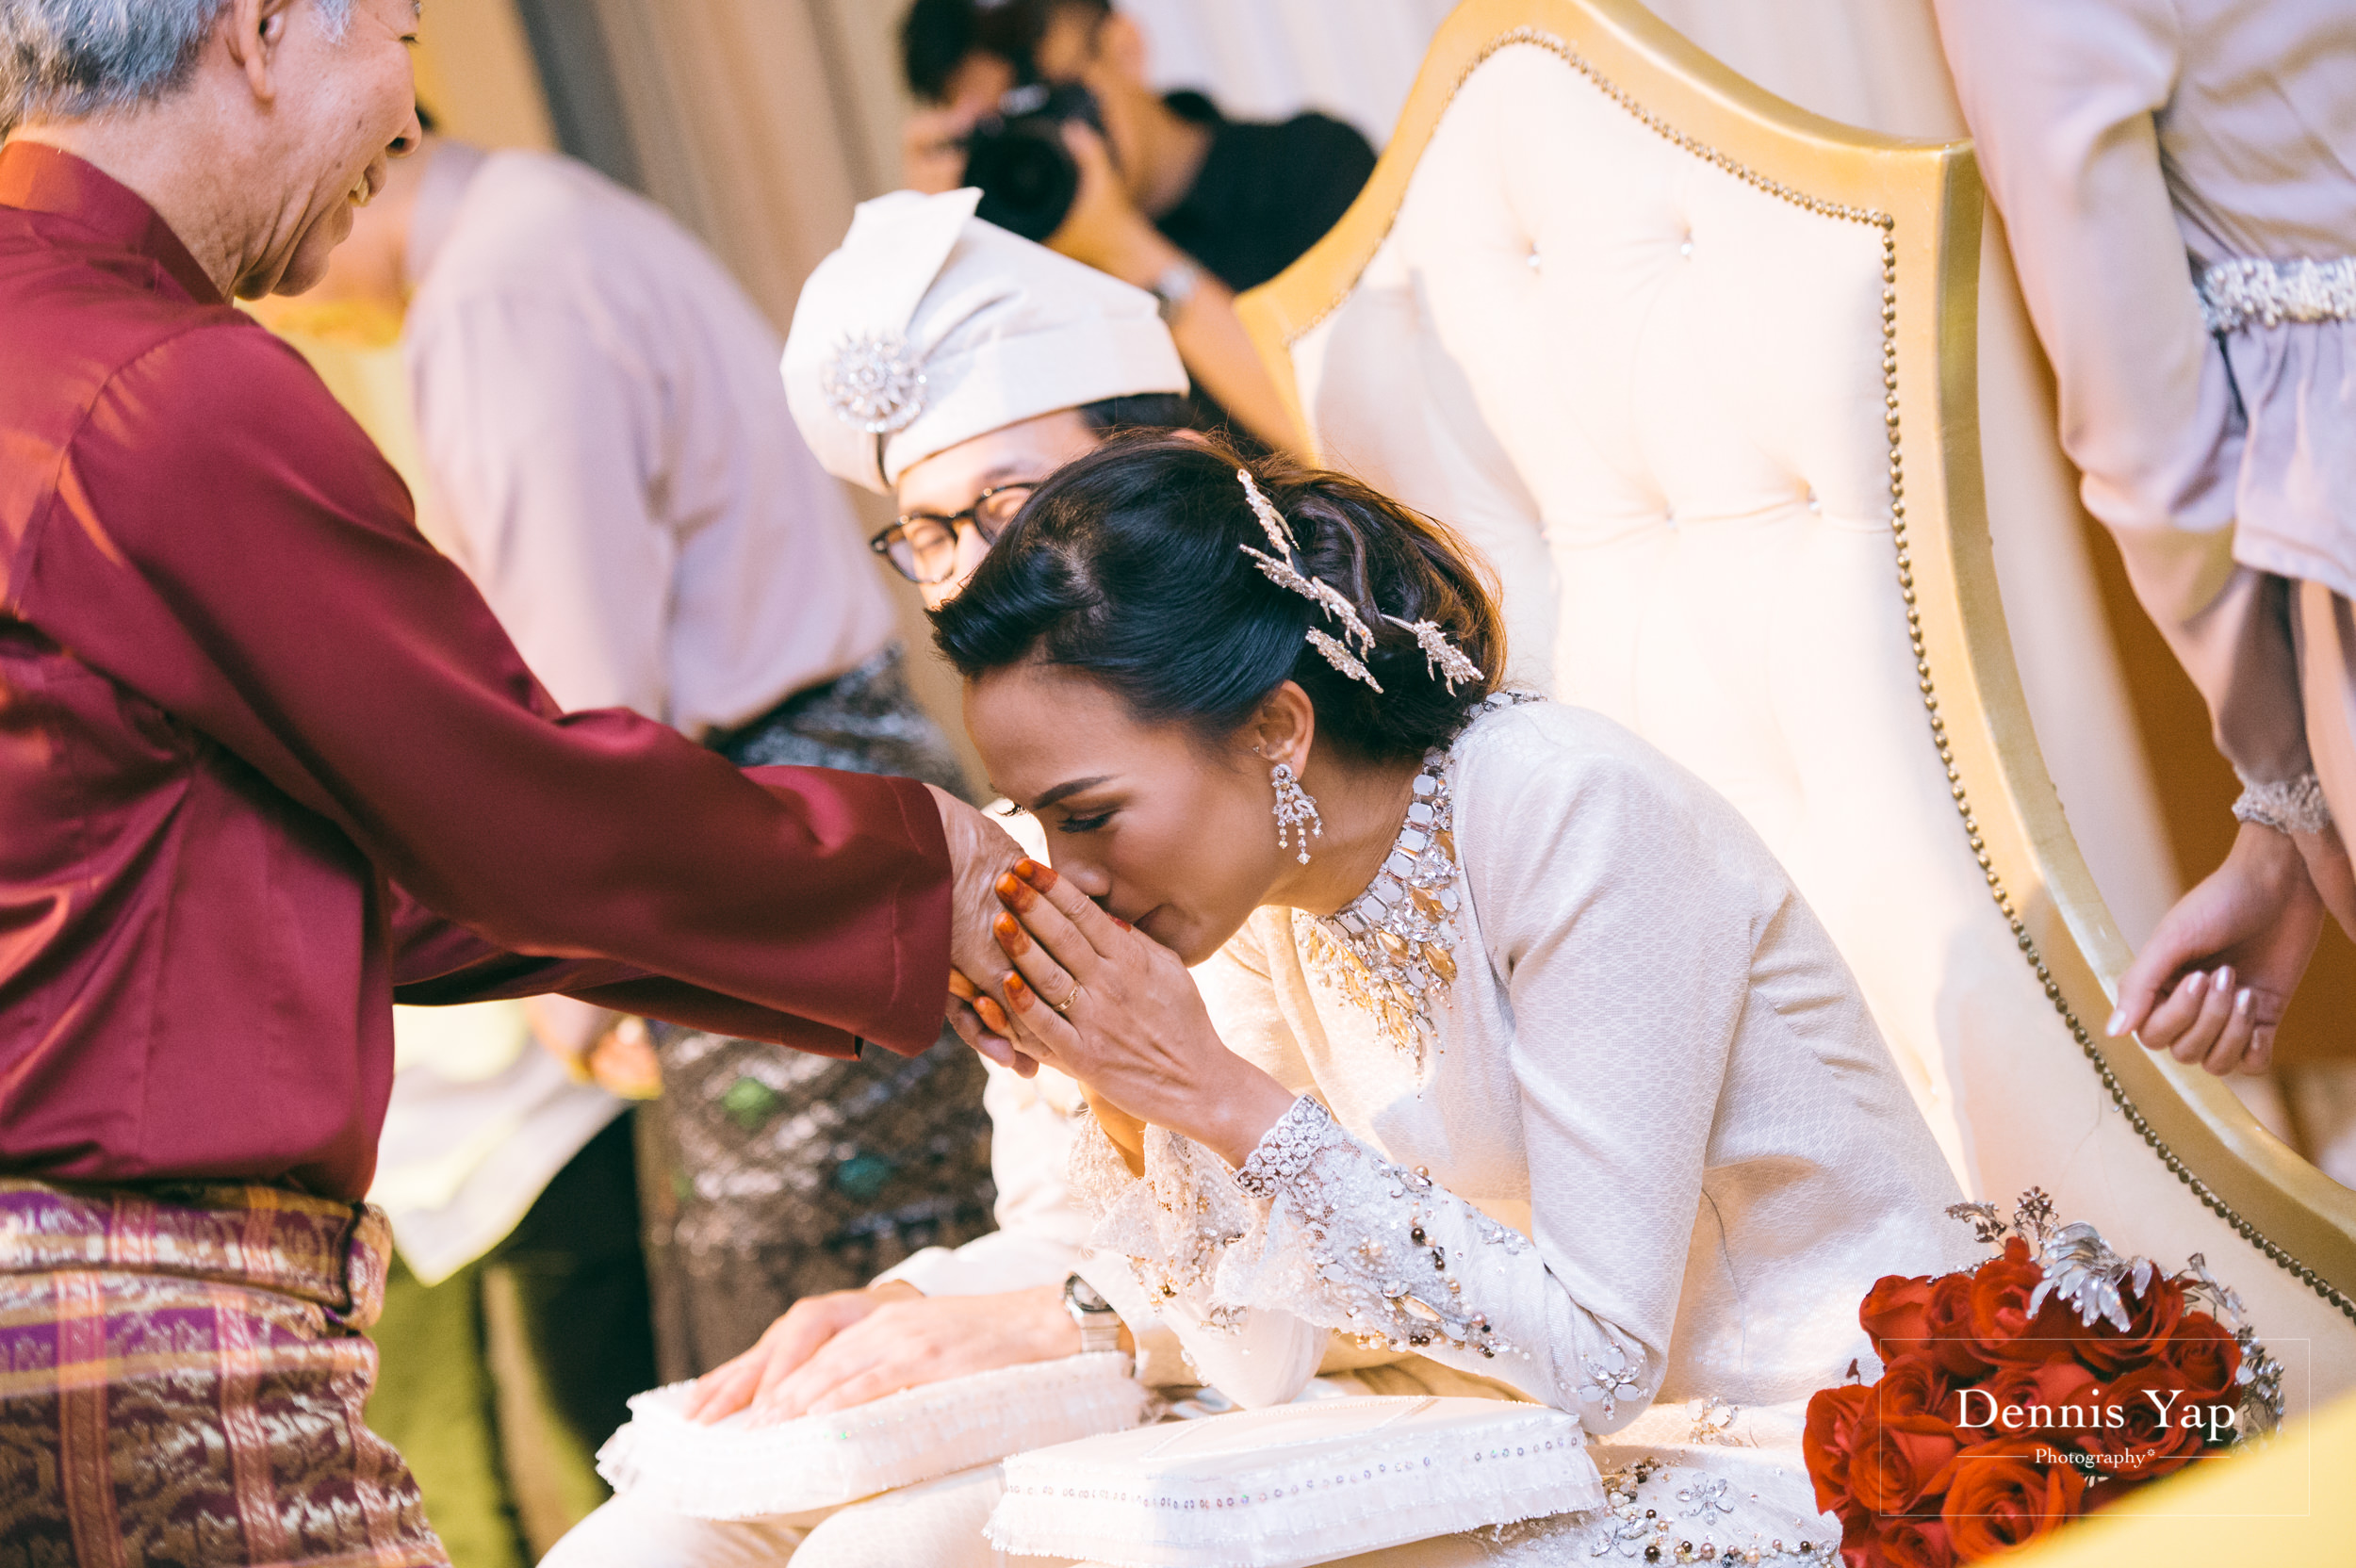 zarif hanalili malay wedding blessing ceremony dennis yap photography-17.jpg